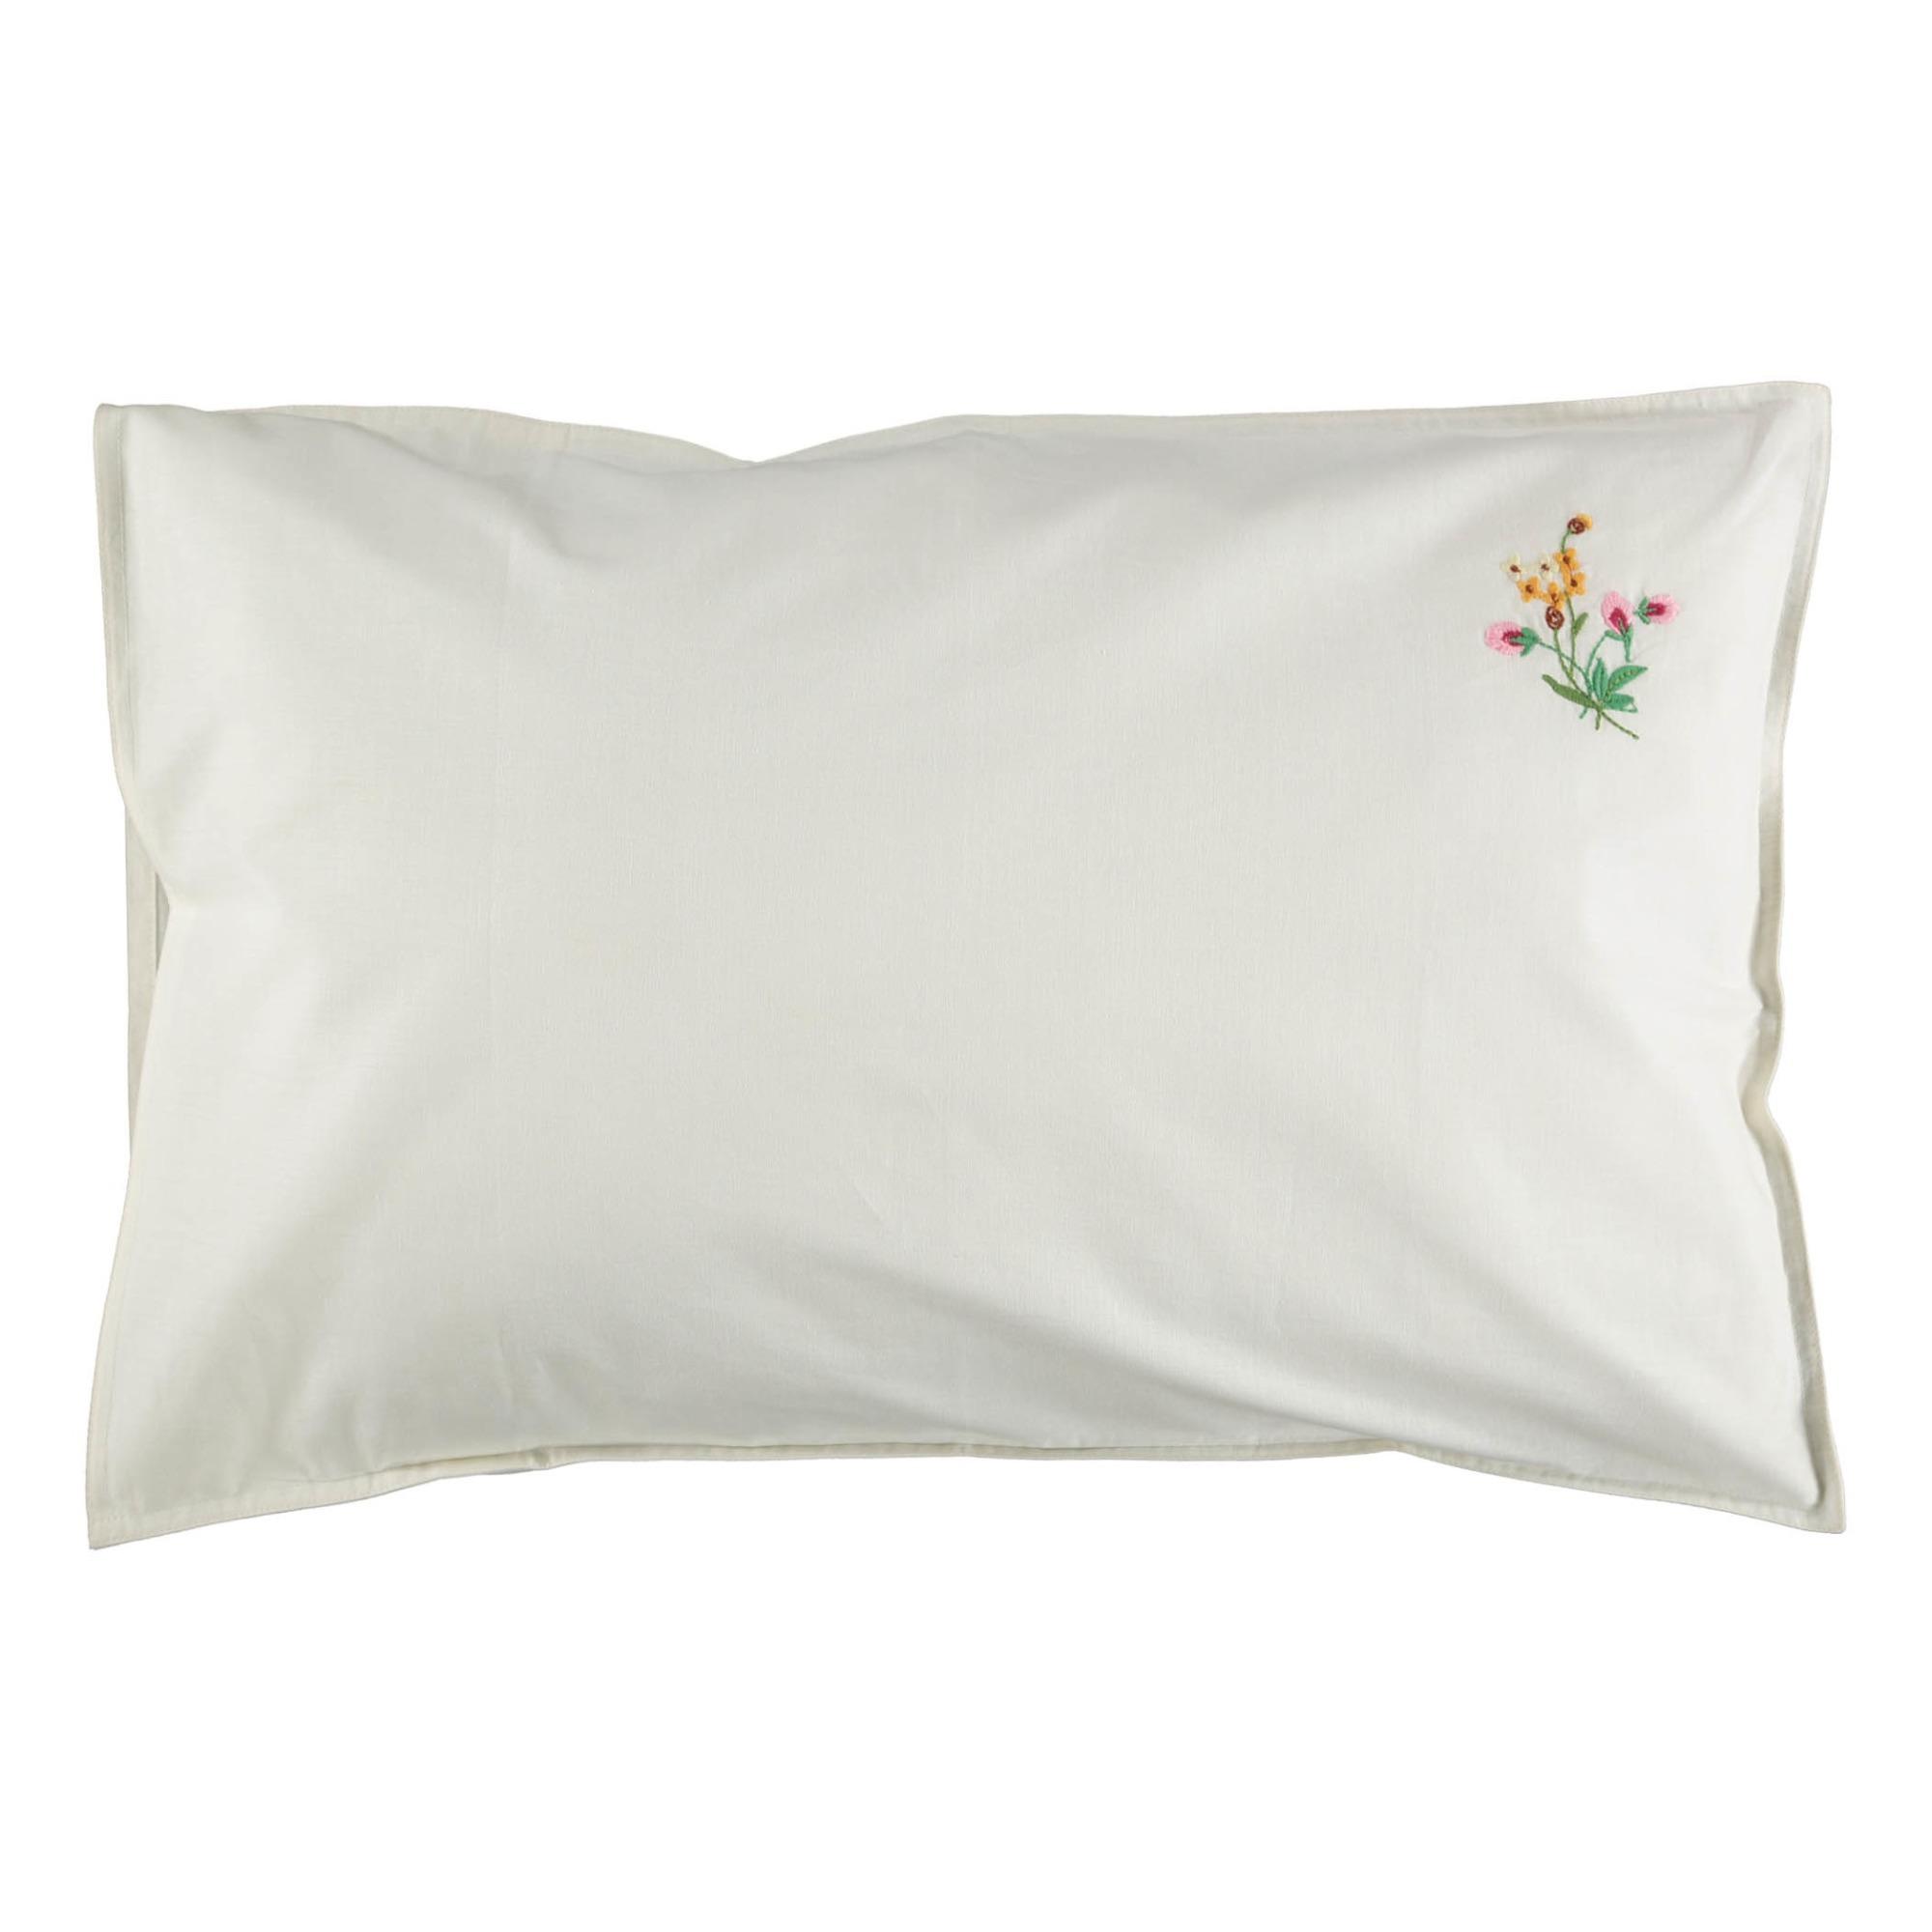 White Floral Pillow Case